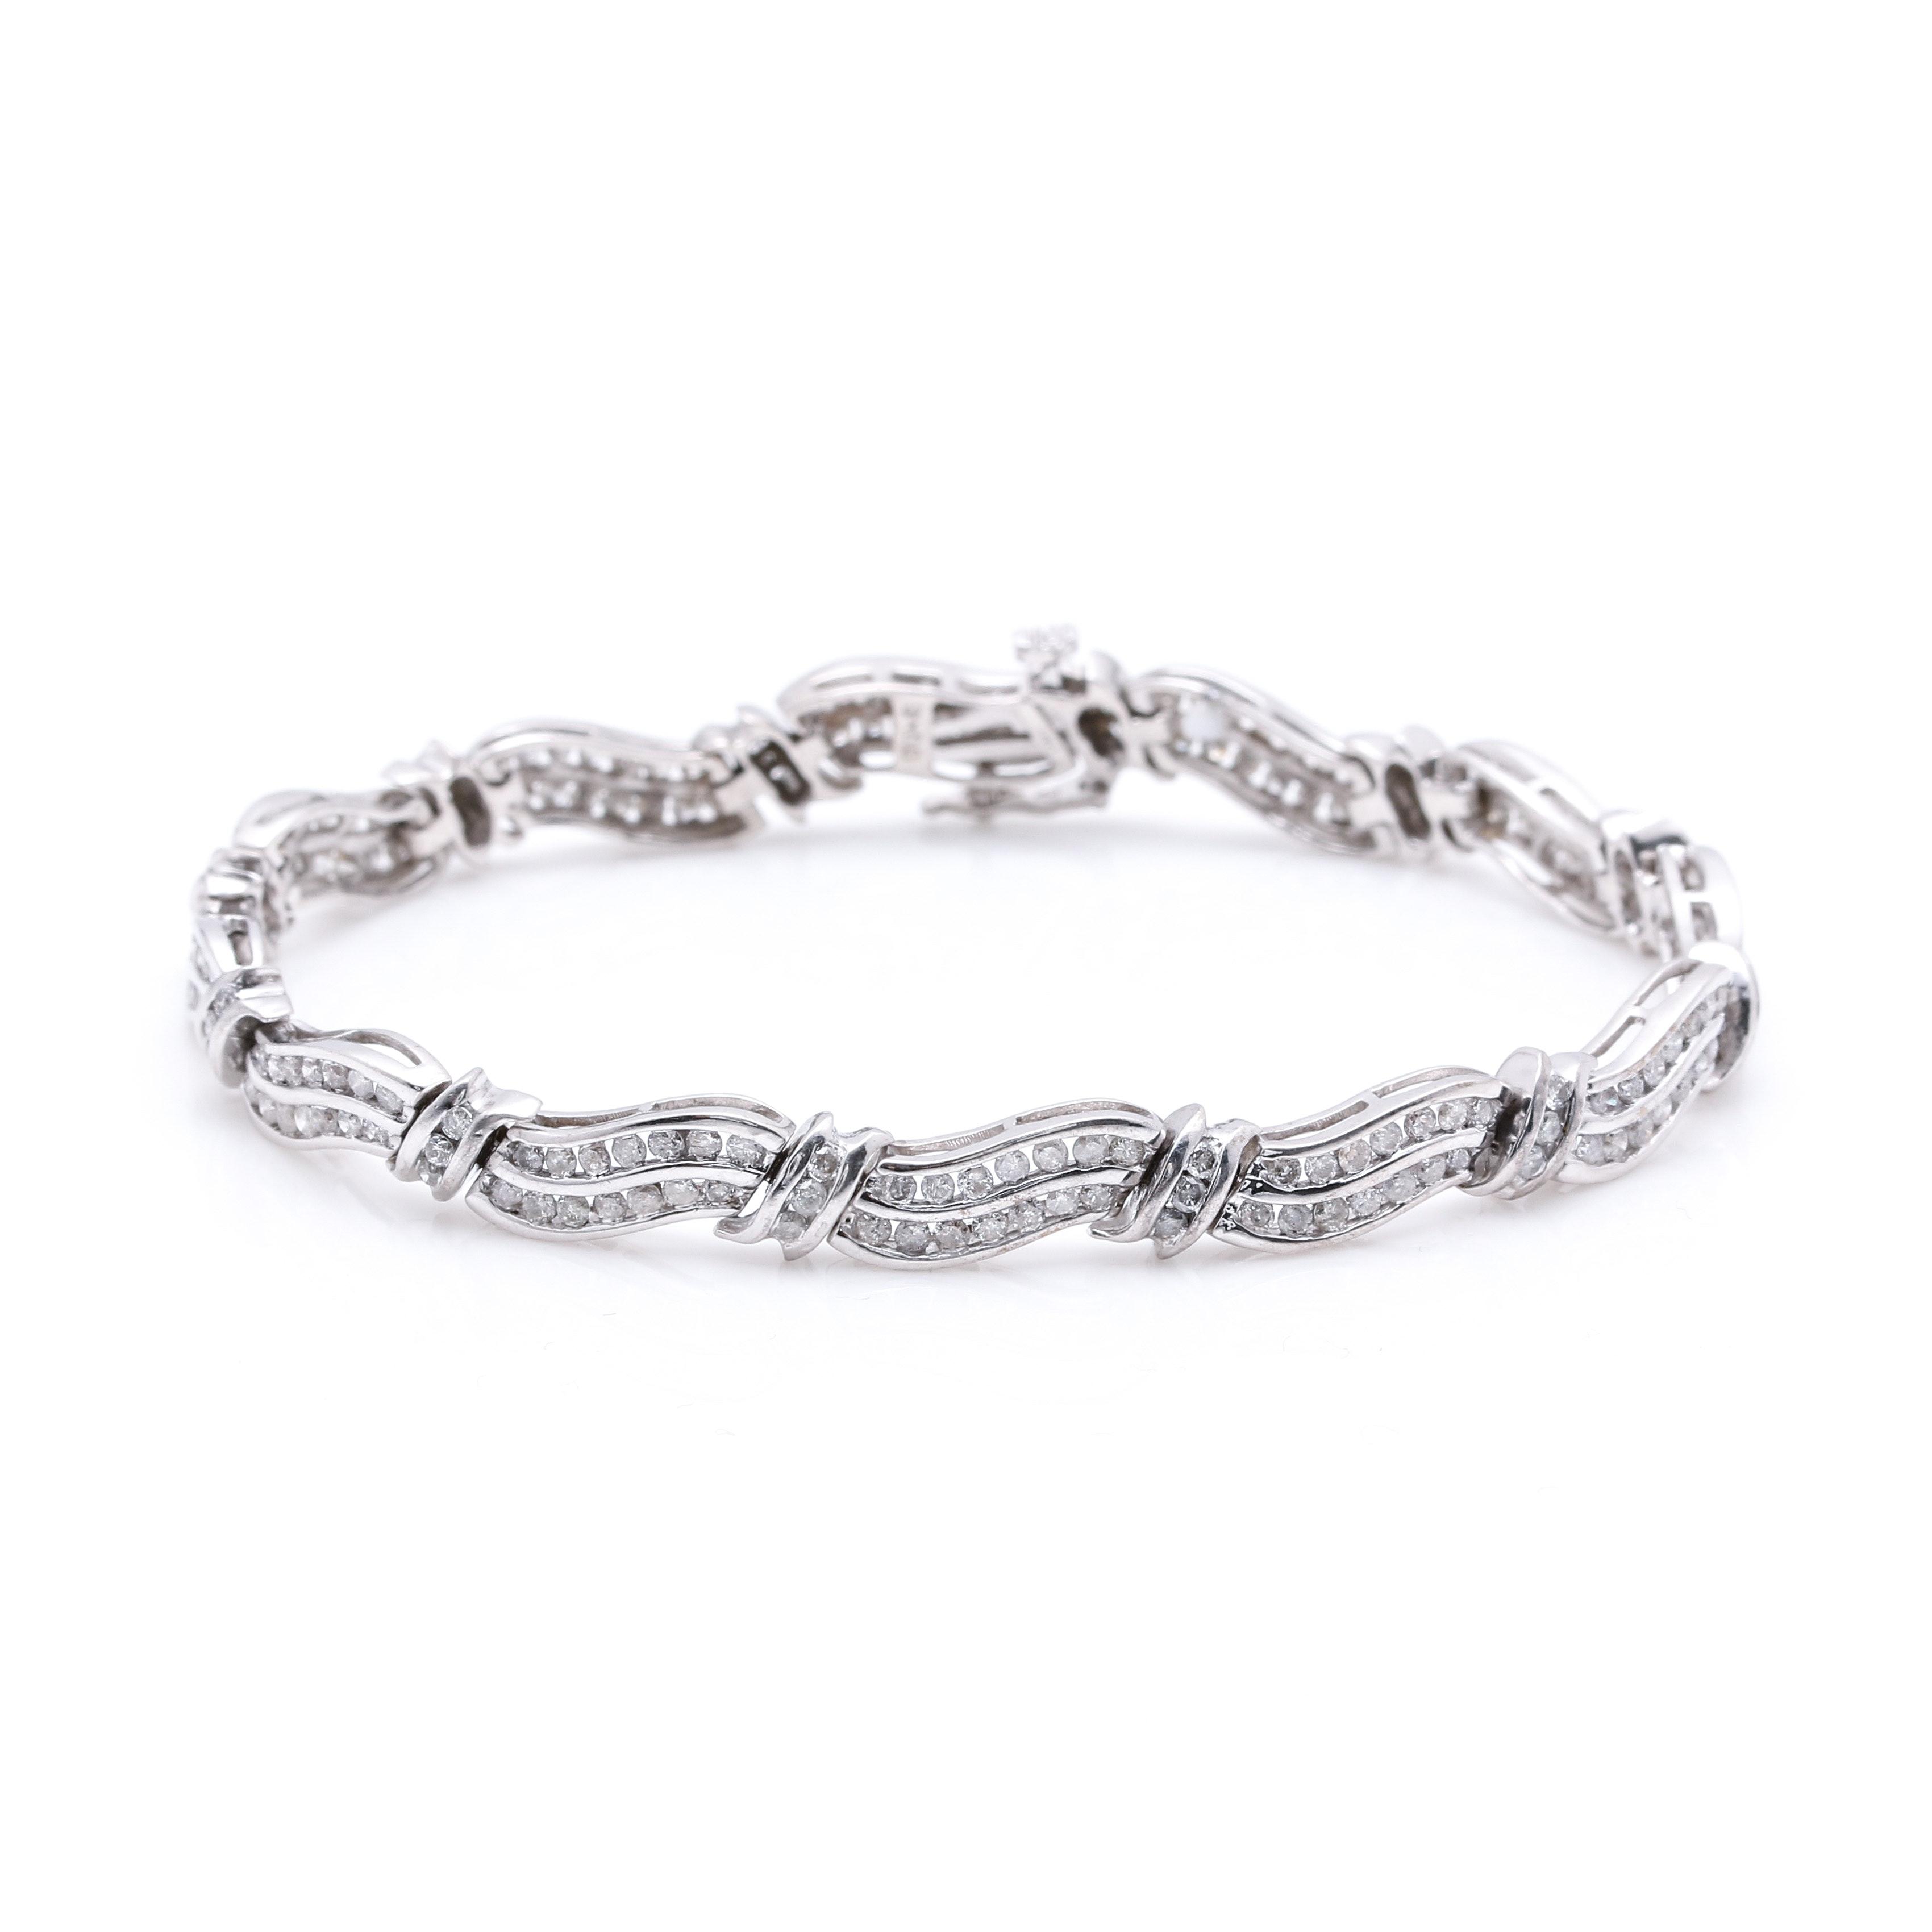 10K White Gold 3.05 CTW Diamond Bracelet